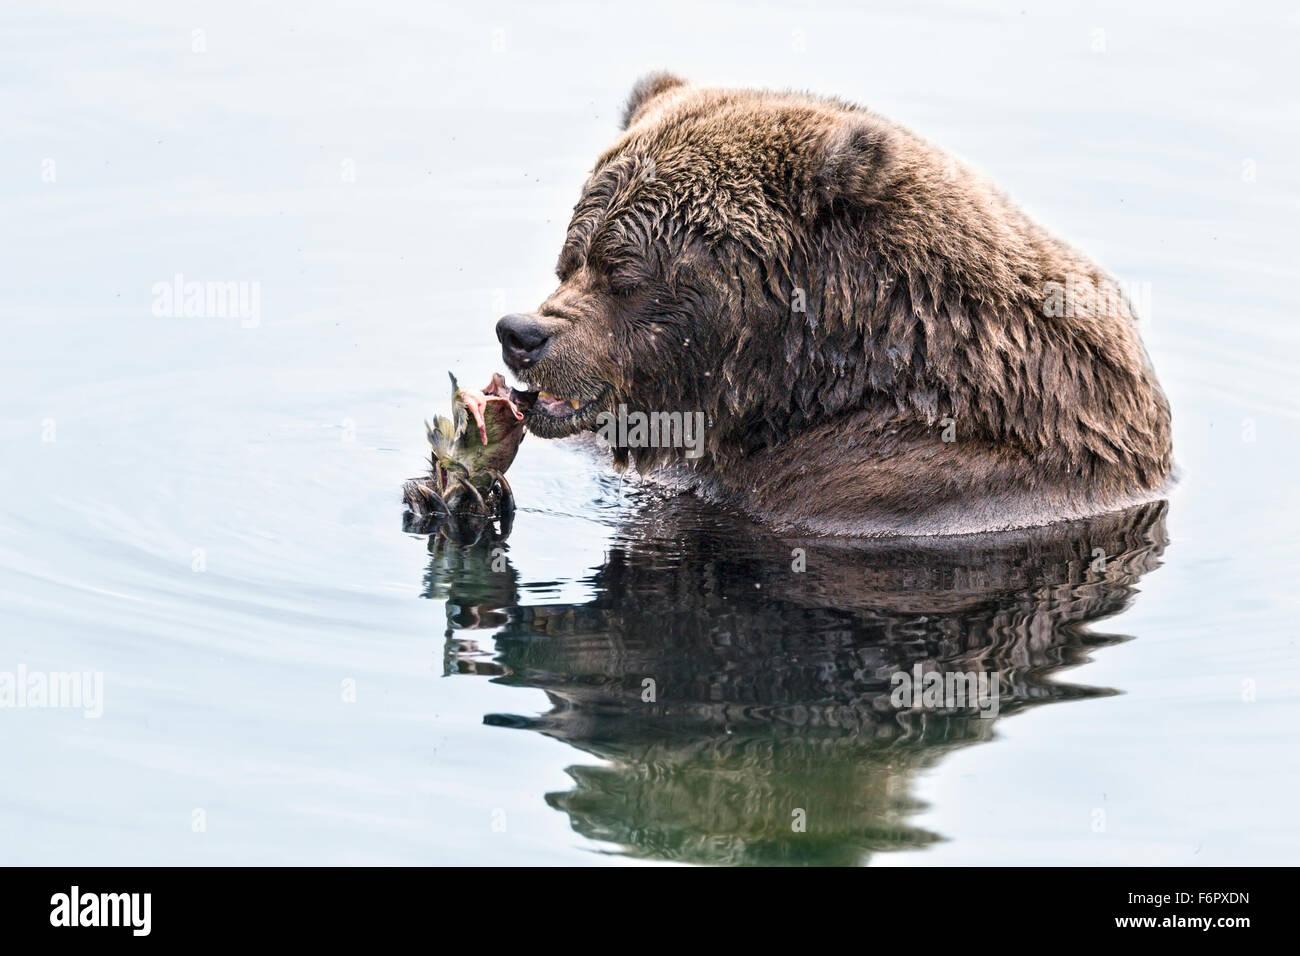 Female brown bear feeding on salmon - Stock Image